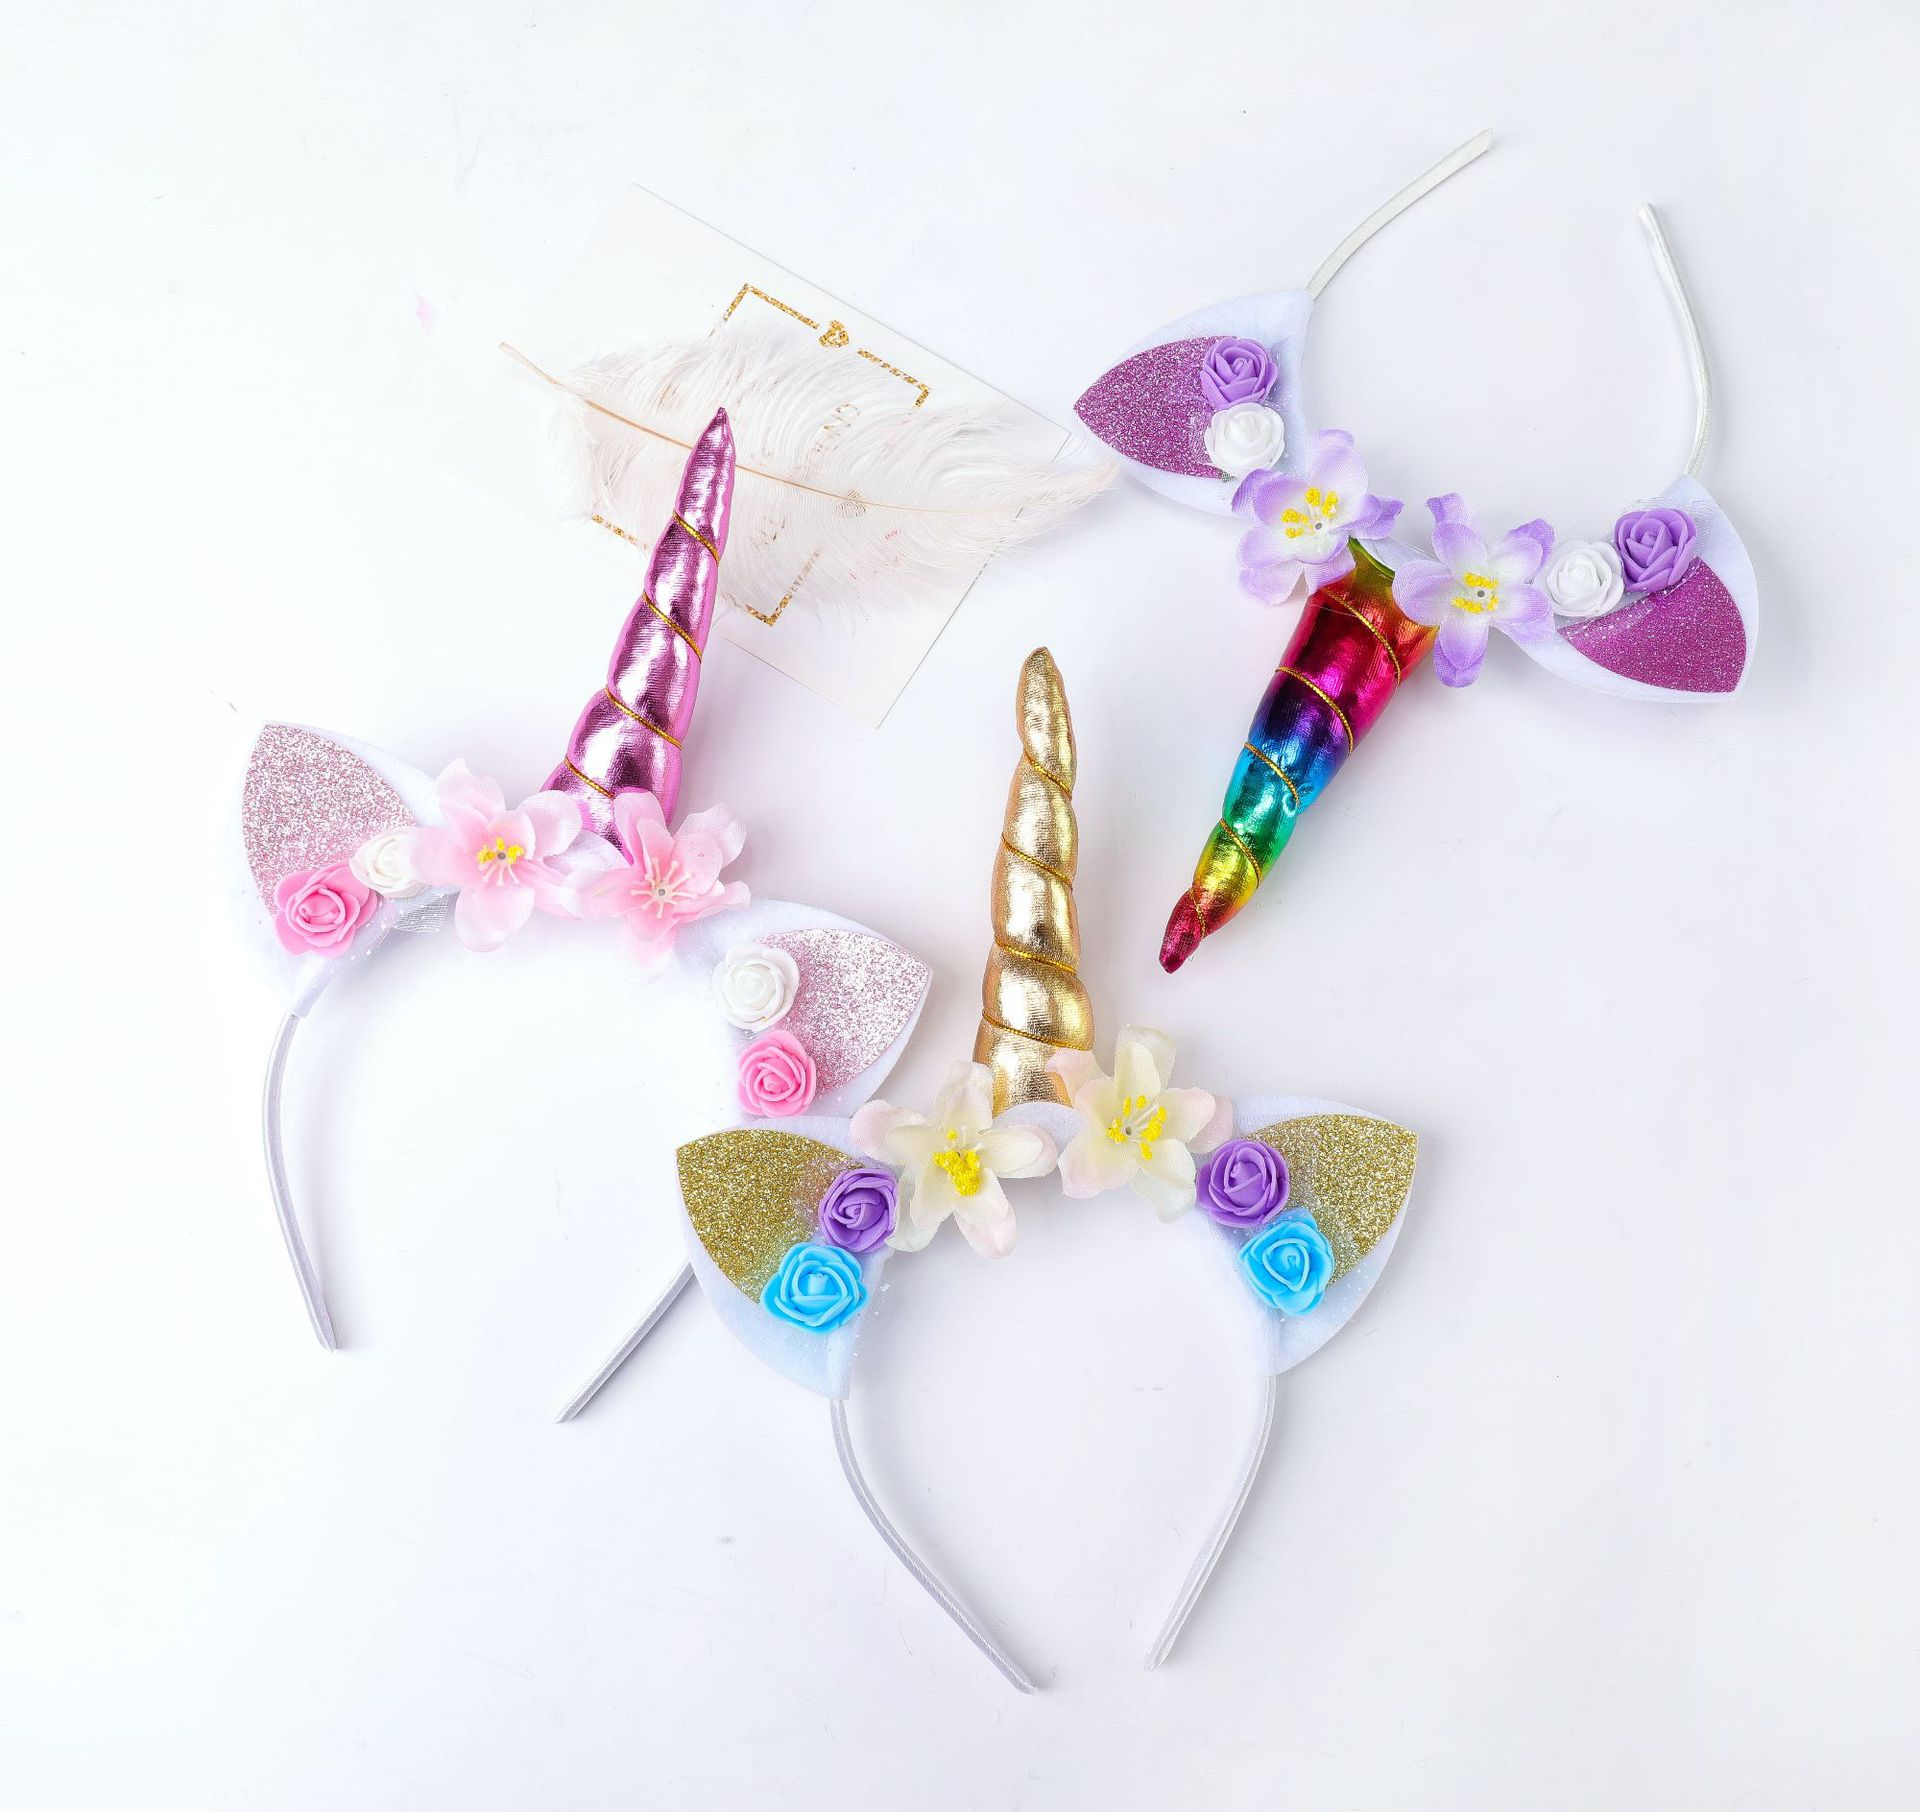 New Girls Cute Unicorn Flower Cat Ears Headbands Children Headwear Photo Props Party Hair Hoop Hairbands Kids Hair Accessories in Hair Accessories from Mother Kids